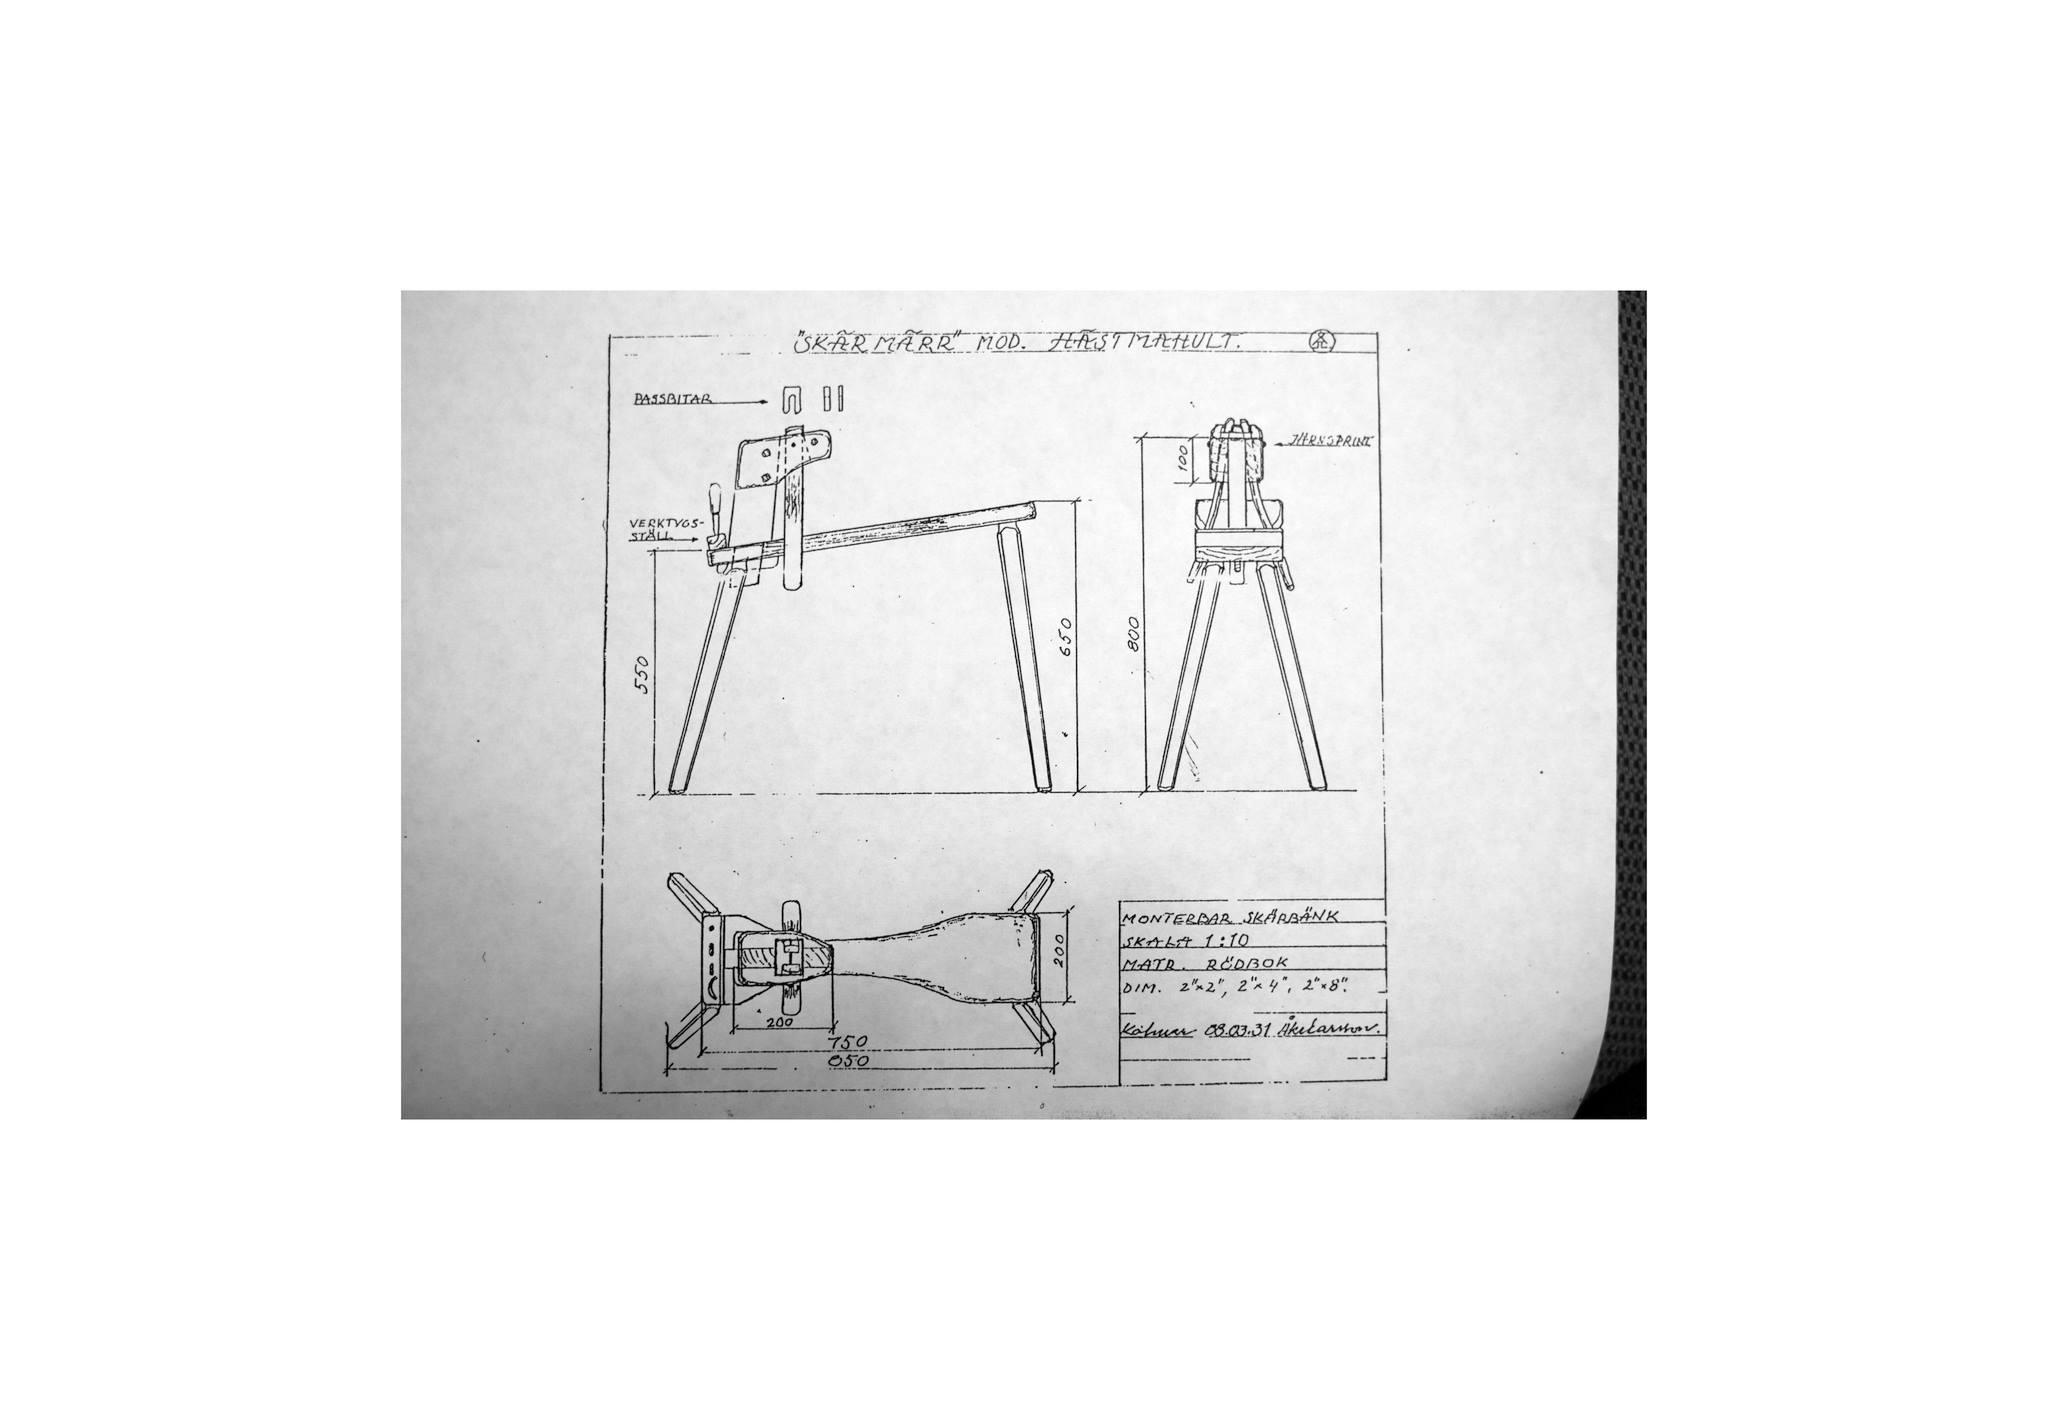 mule body diagram [ 1500 x 1033 Pixel ]